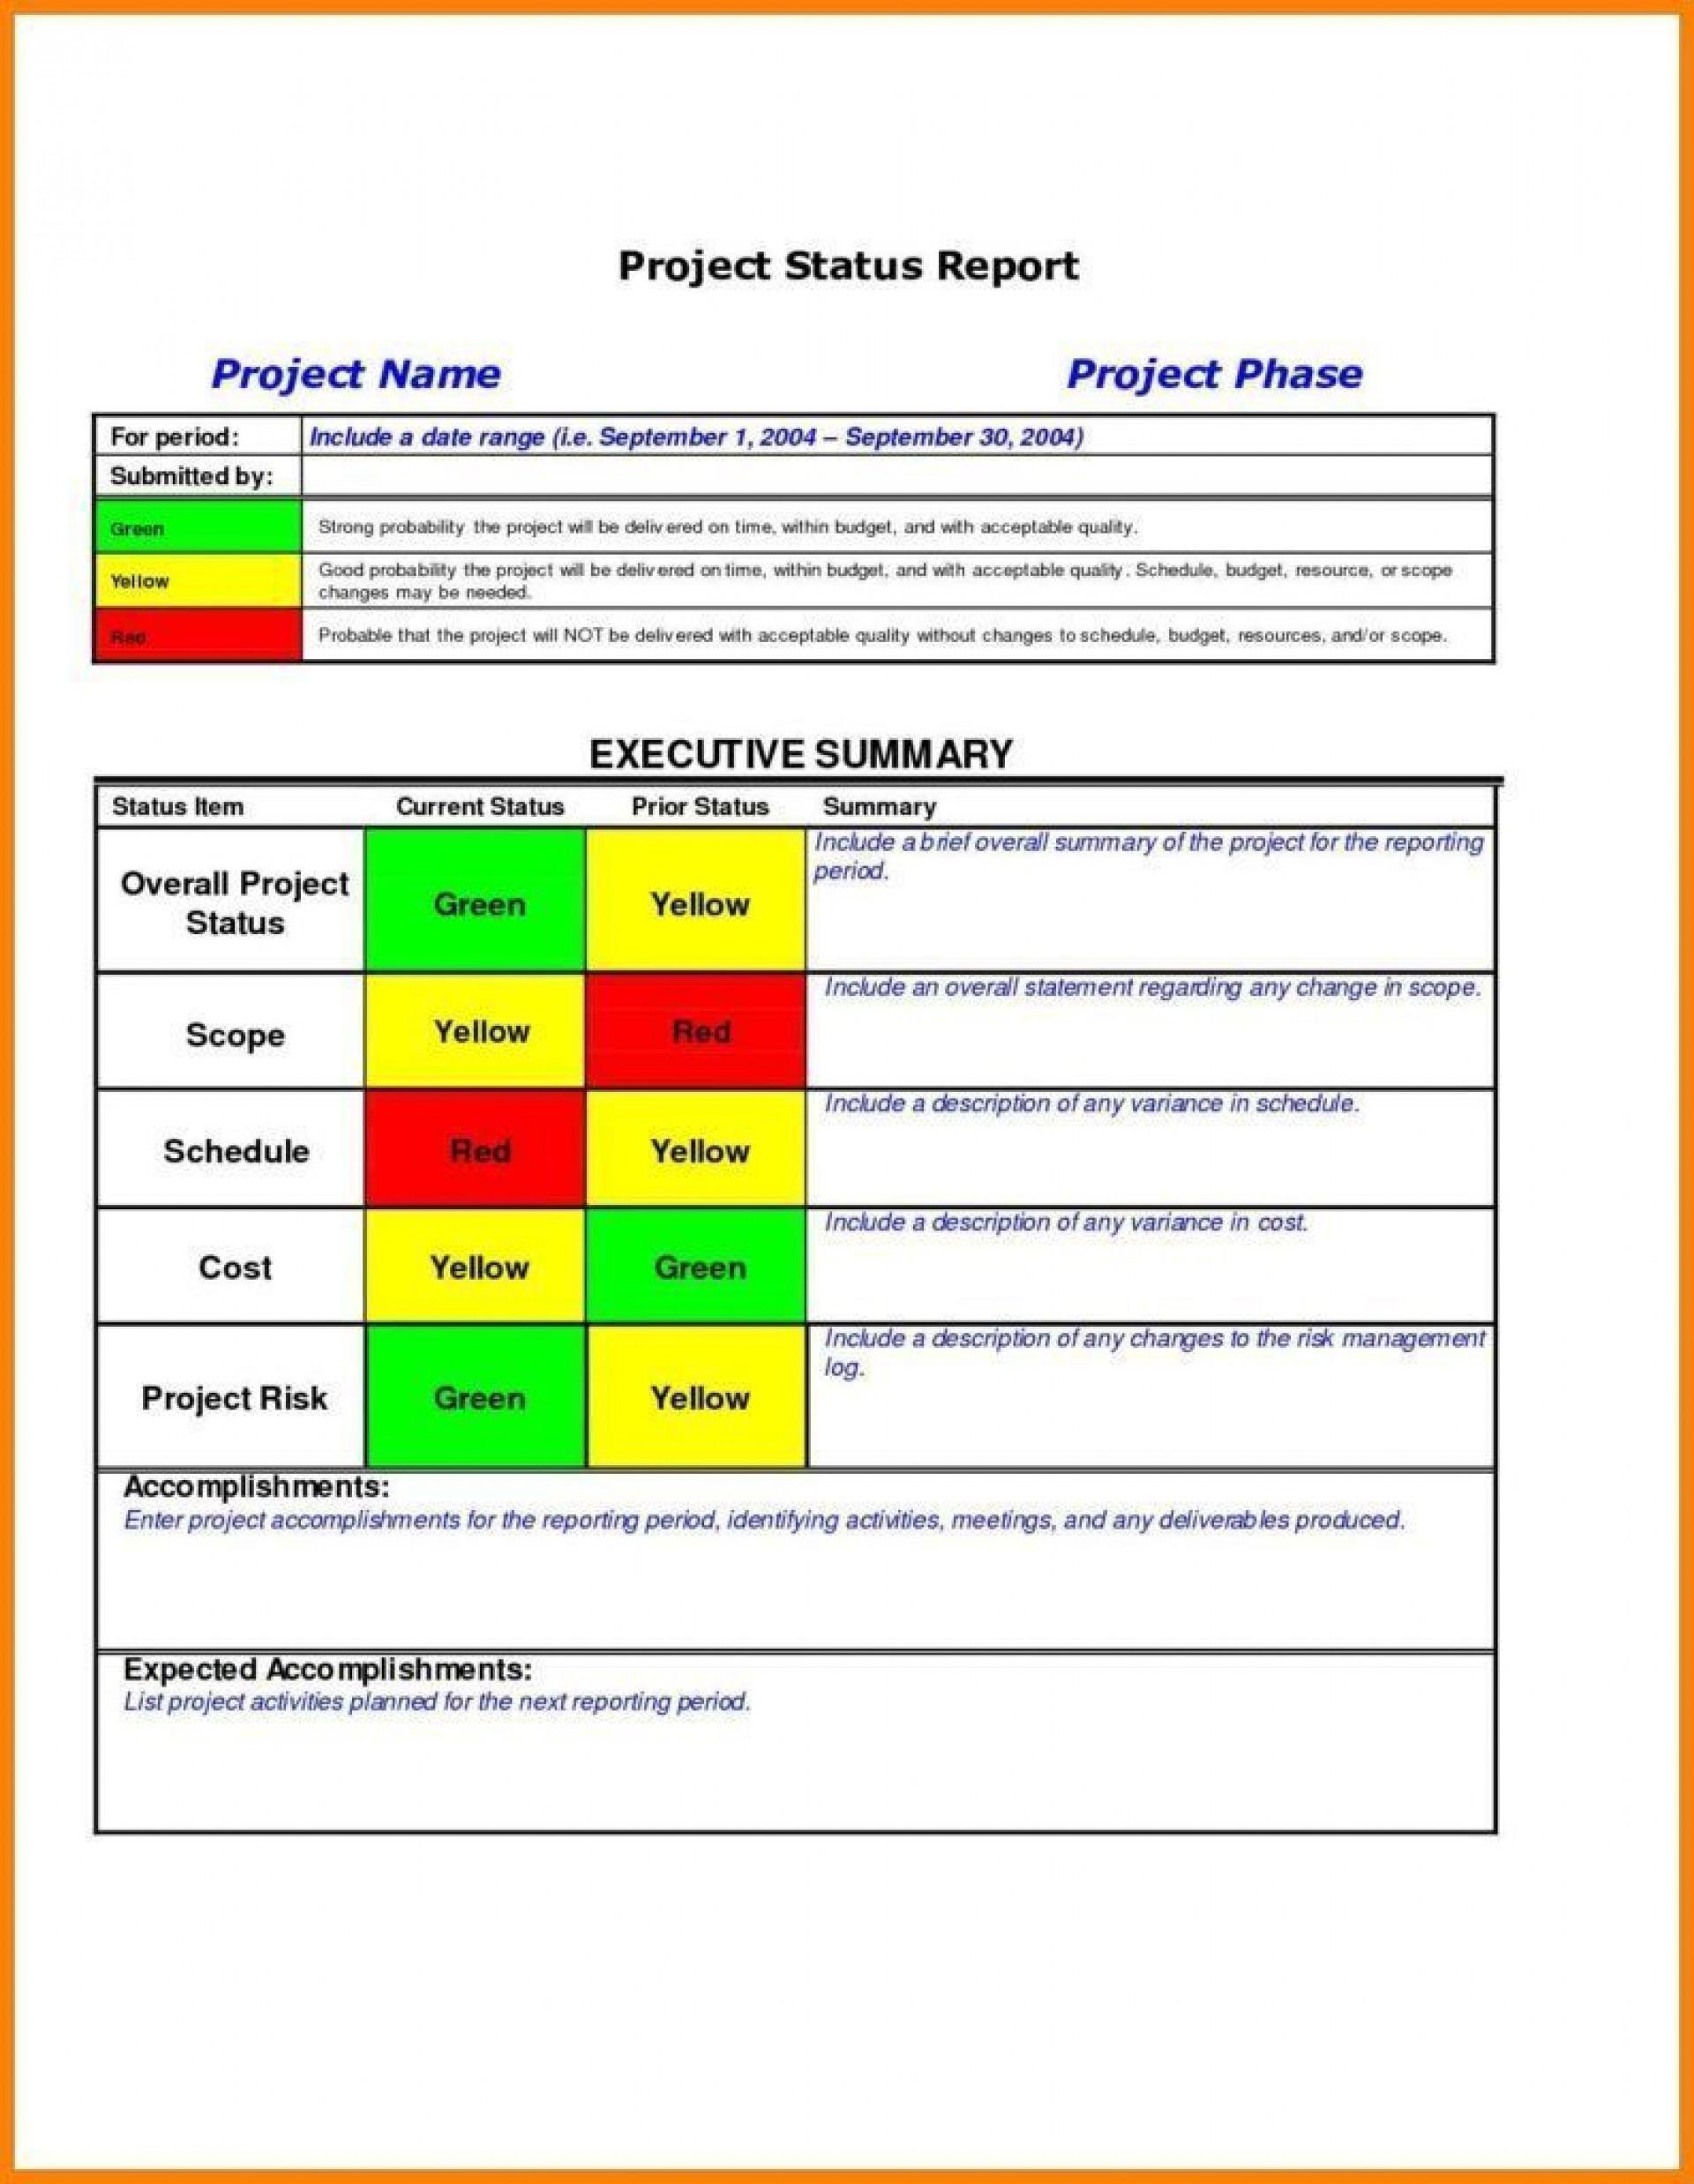 005 Surprising Project Management Report Template Excel Design  Weekly Statu Progres1920